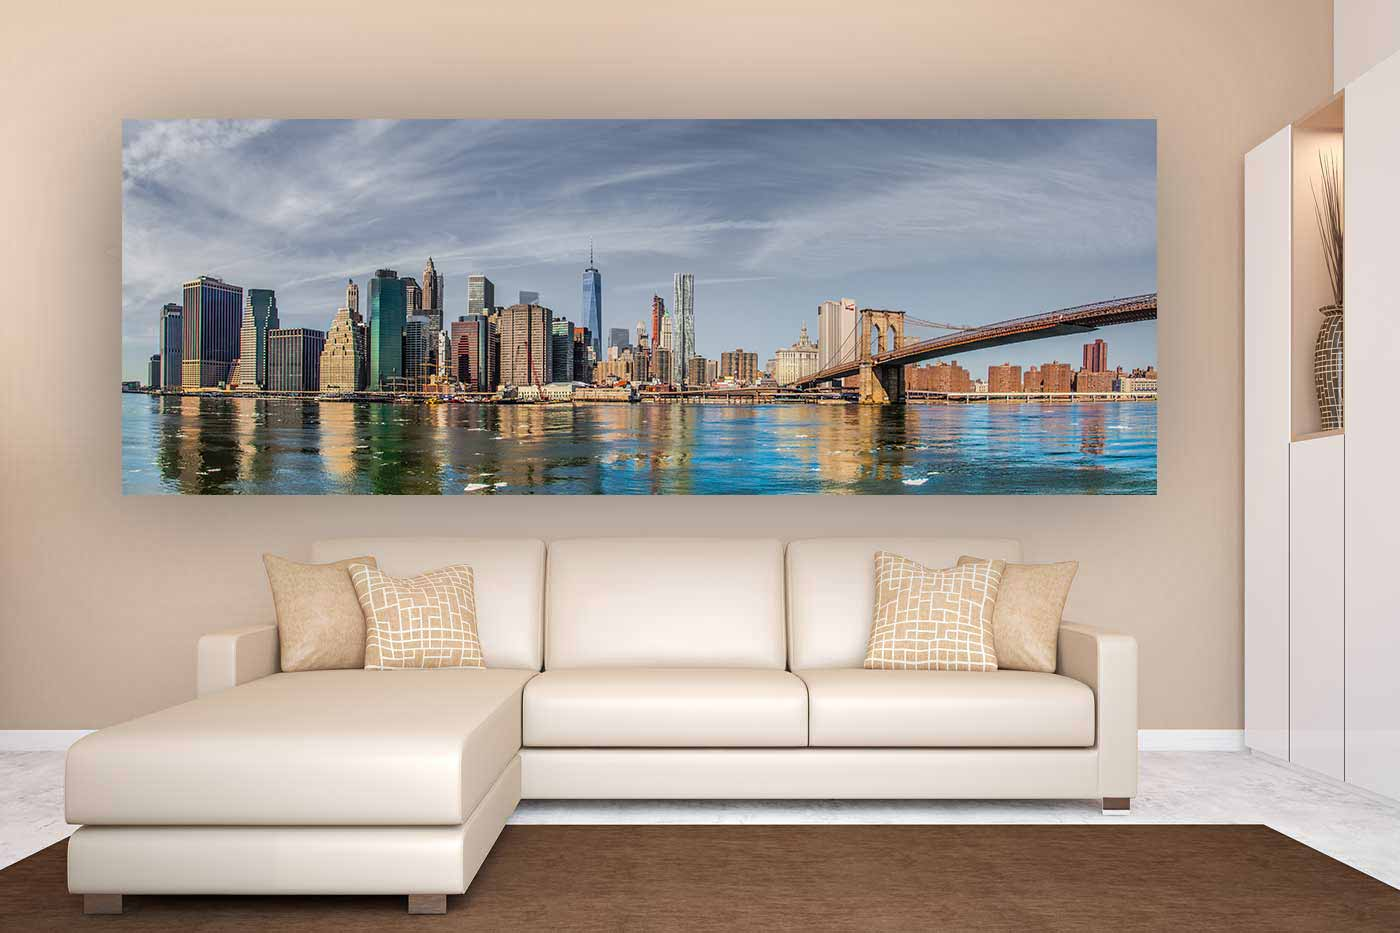 New York Leinwandbild ~ Leinwandbilder new york city panorama kunst bilder vom hudson